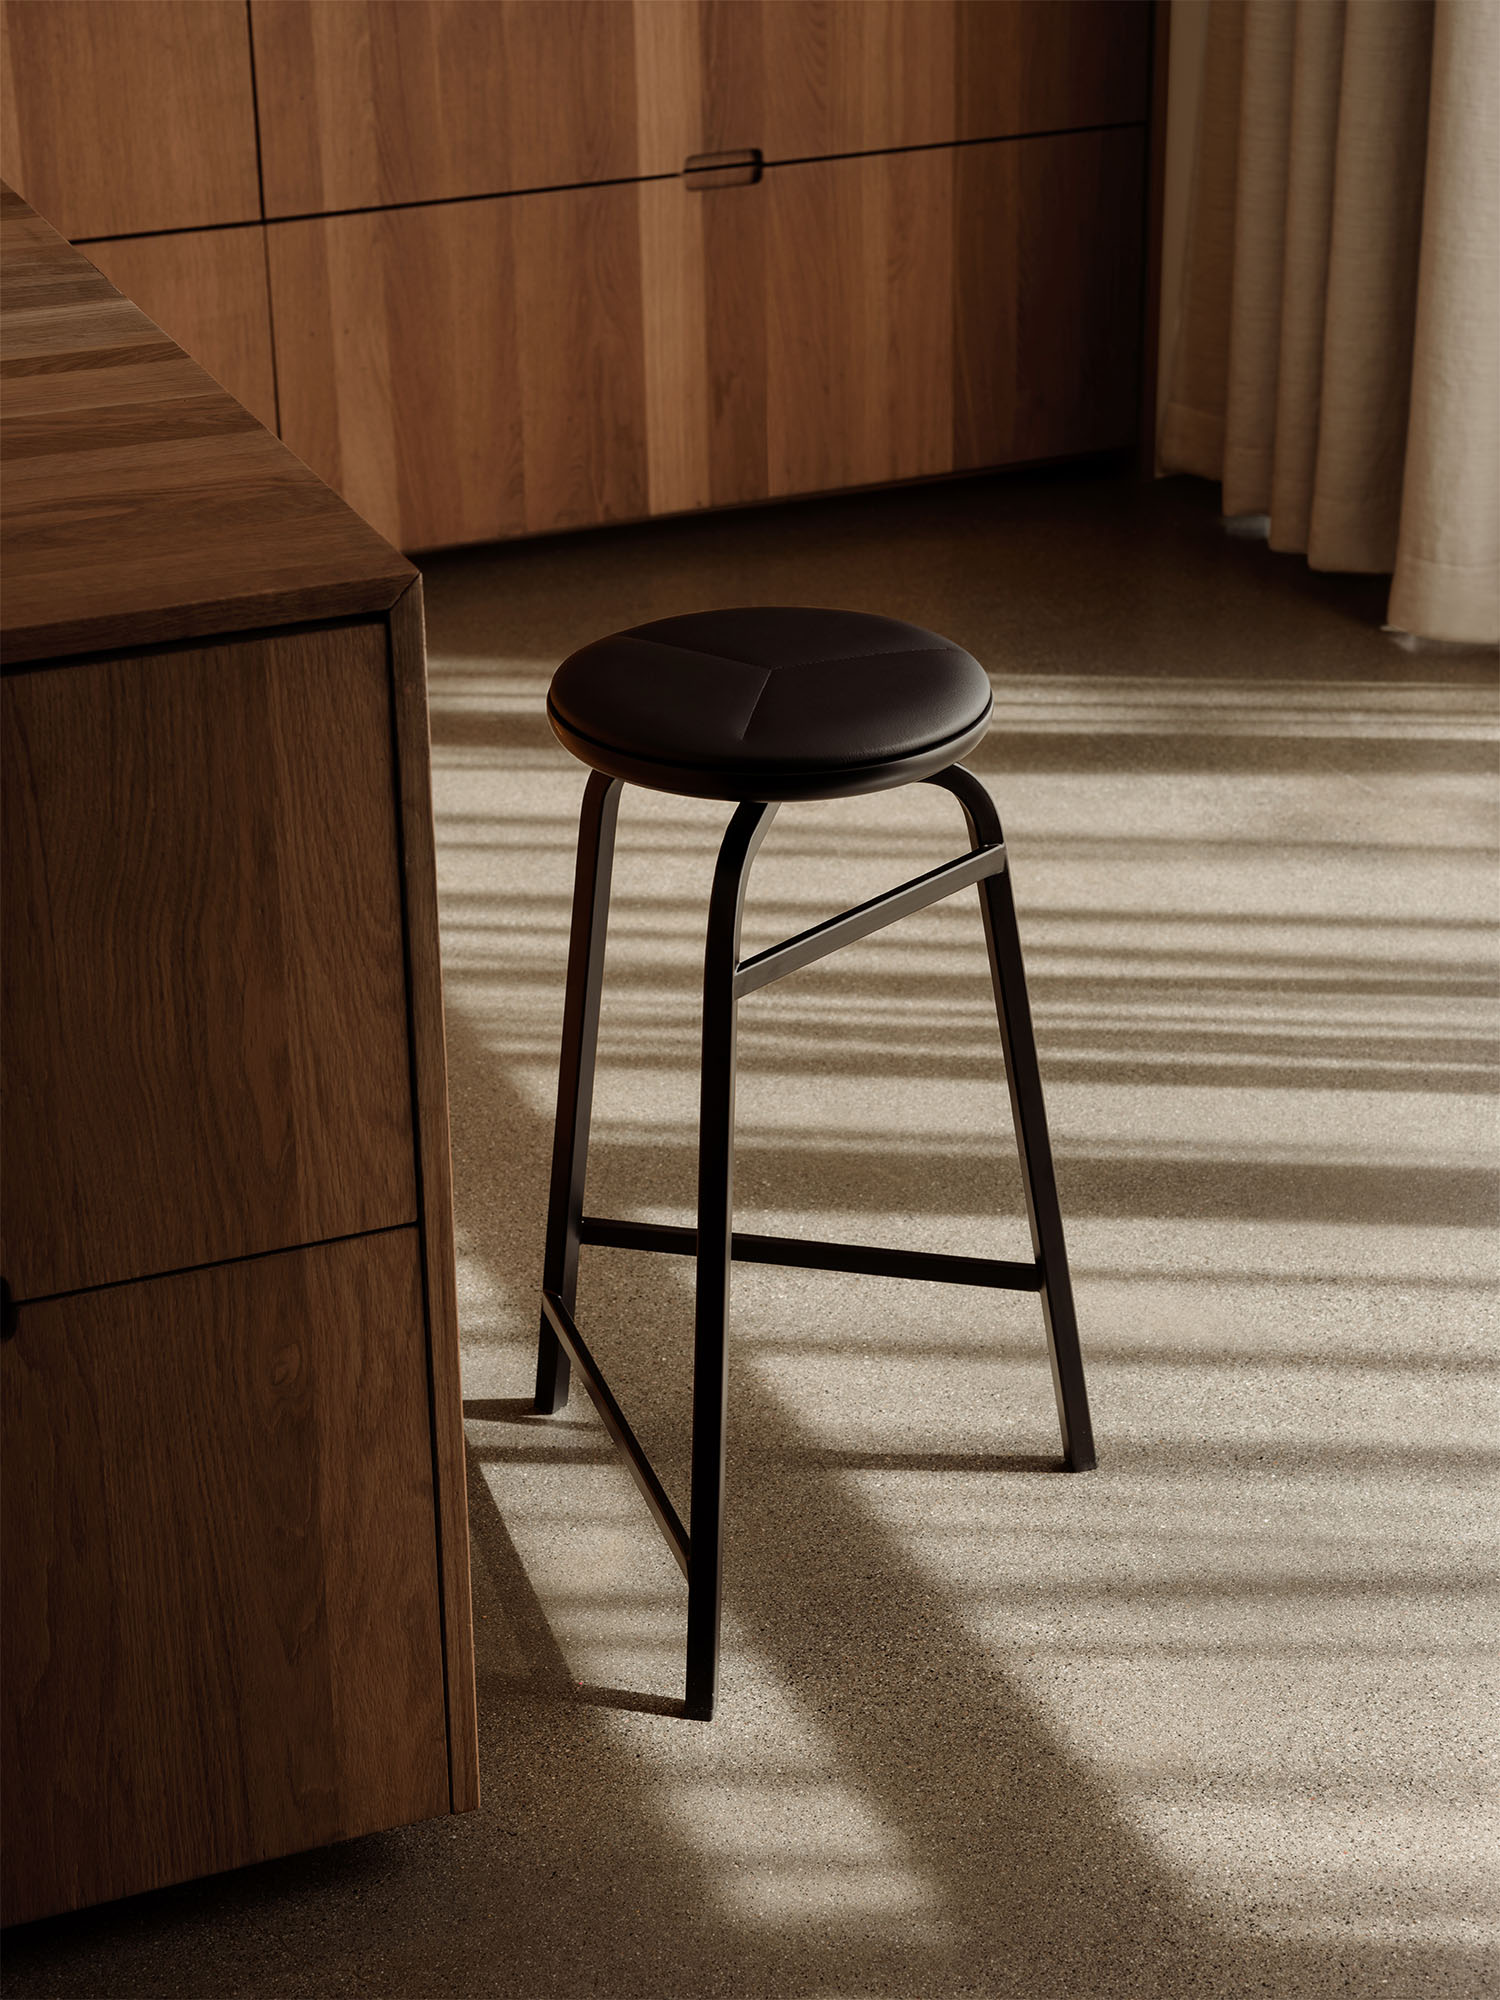 Treble_bar_stool_black_single_kitchen_Northern_Photo_Einar_Aslaksen_Low-res